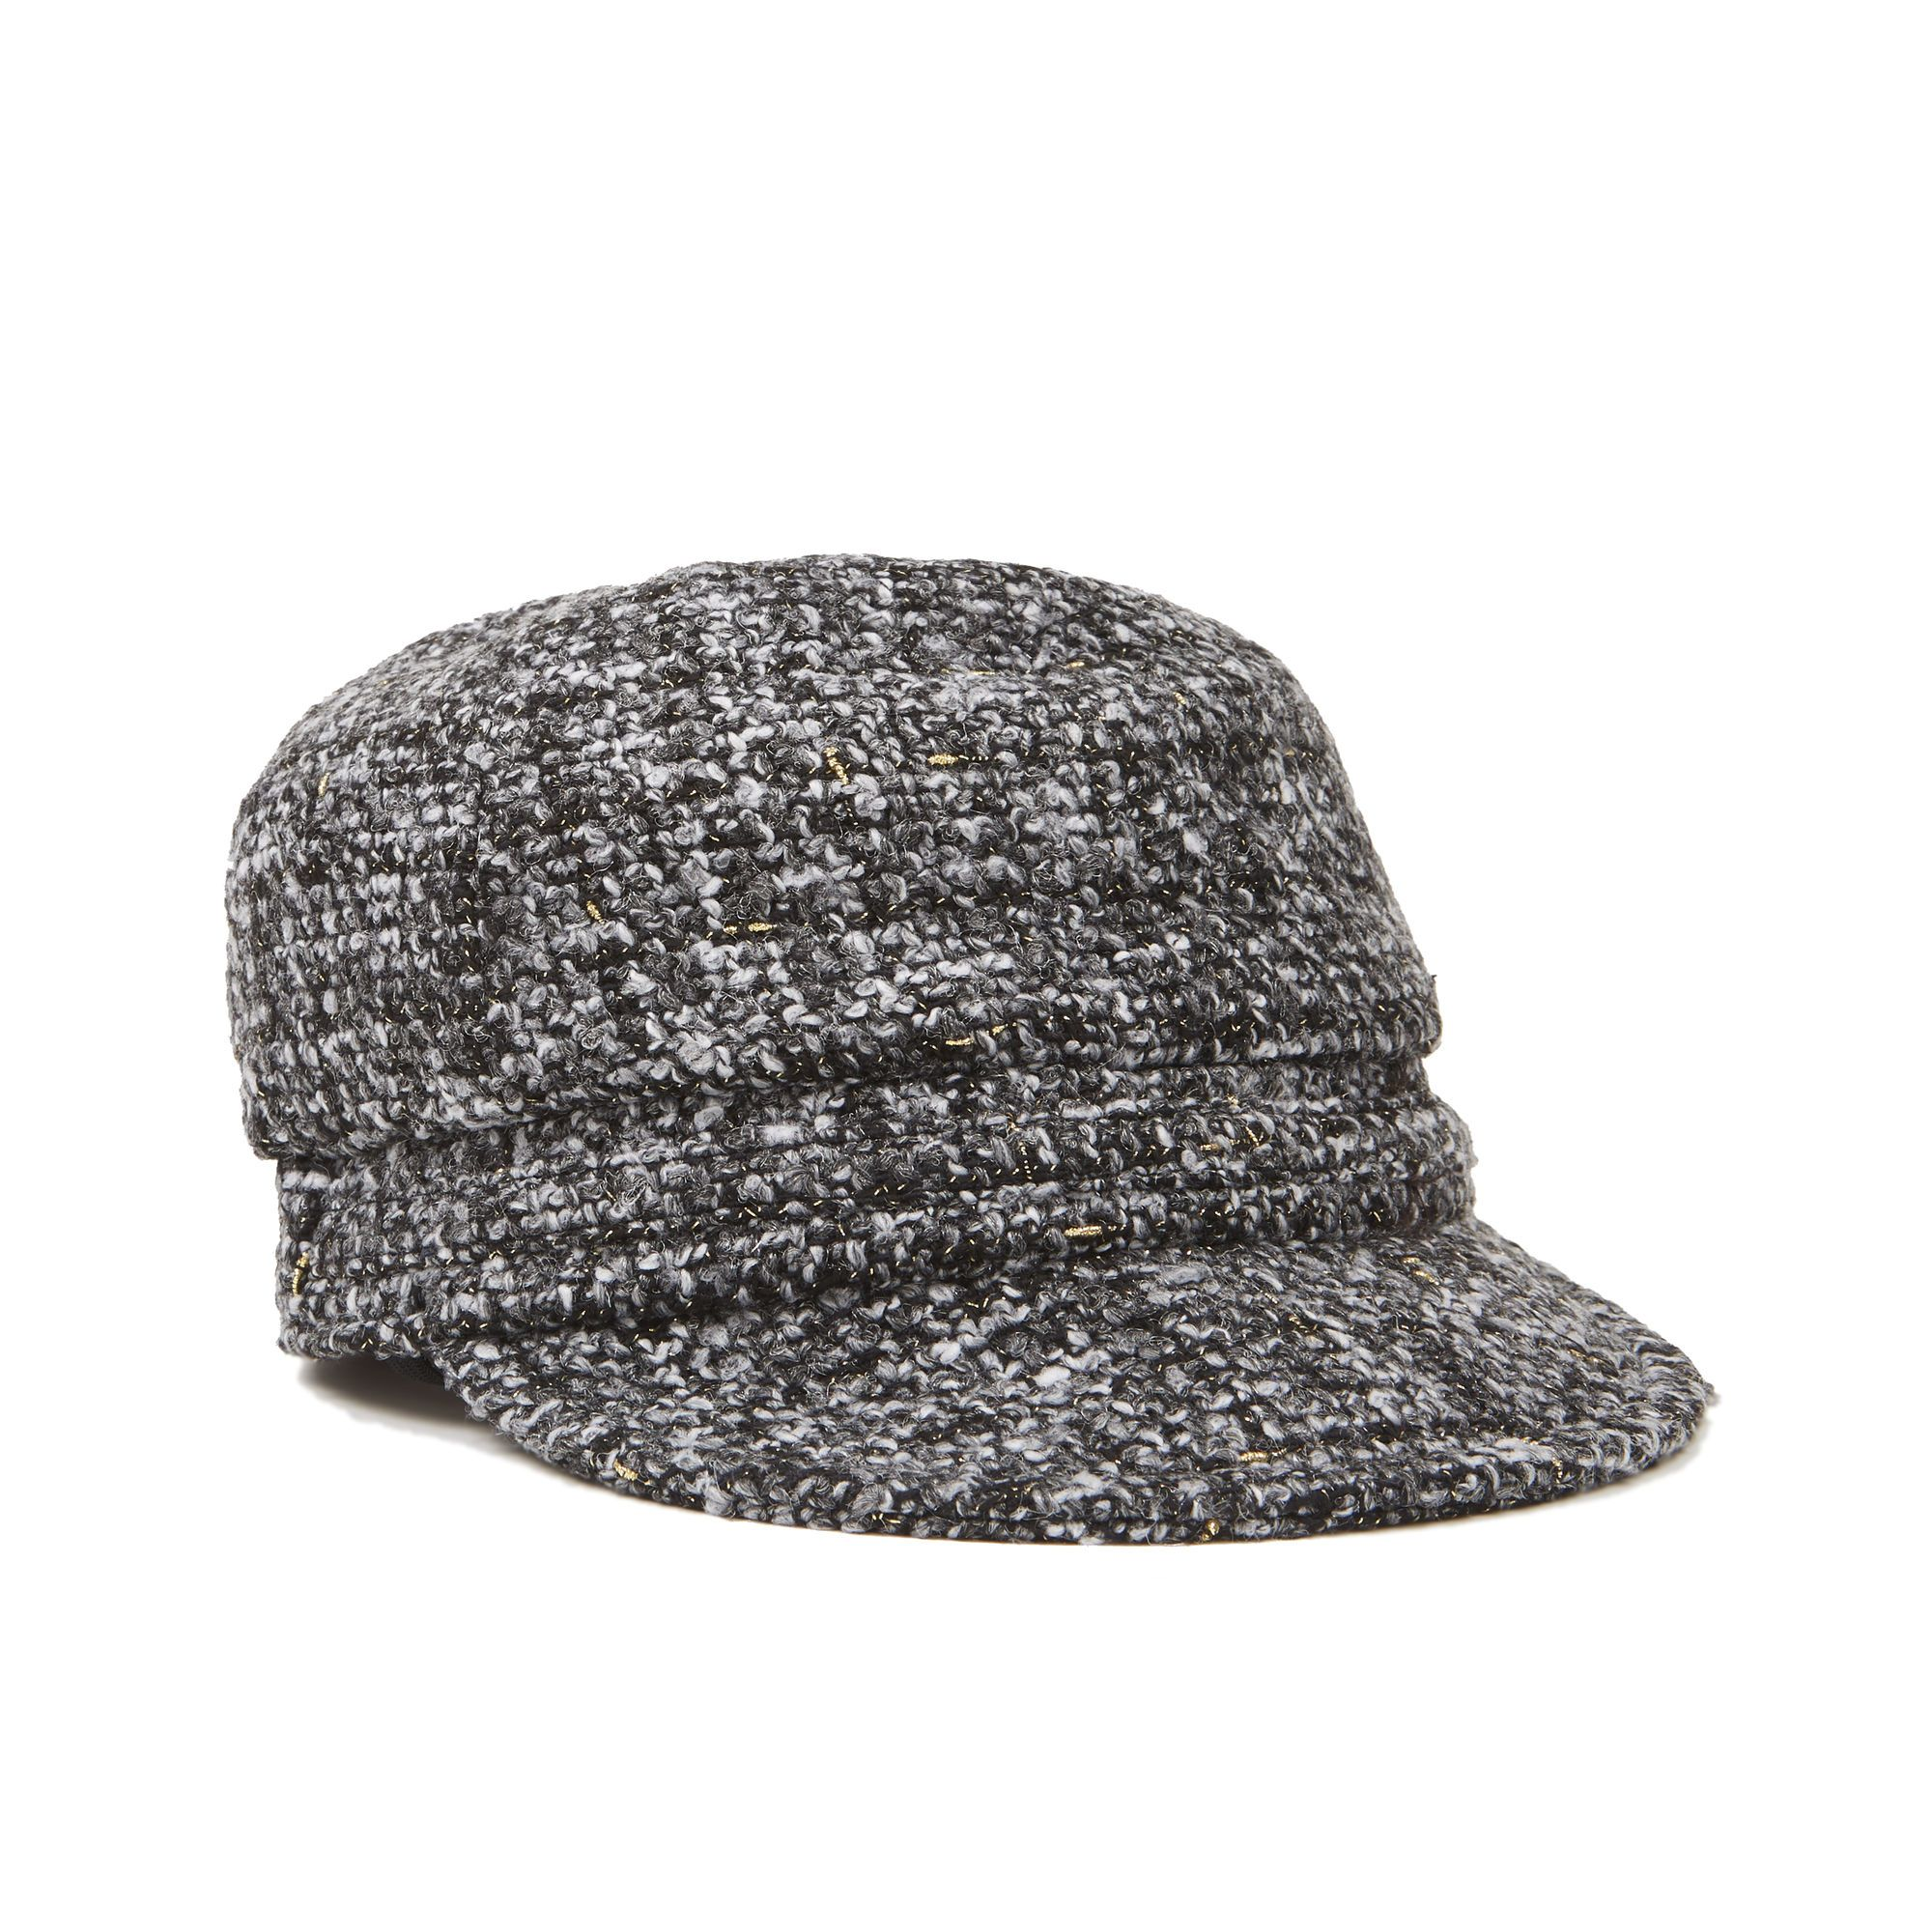 402a4a3a4b5 Tweed Newsboy Cap